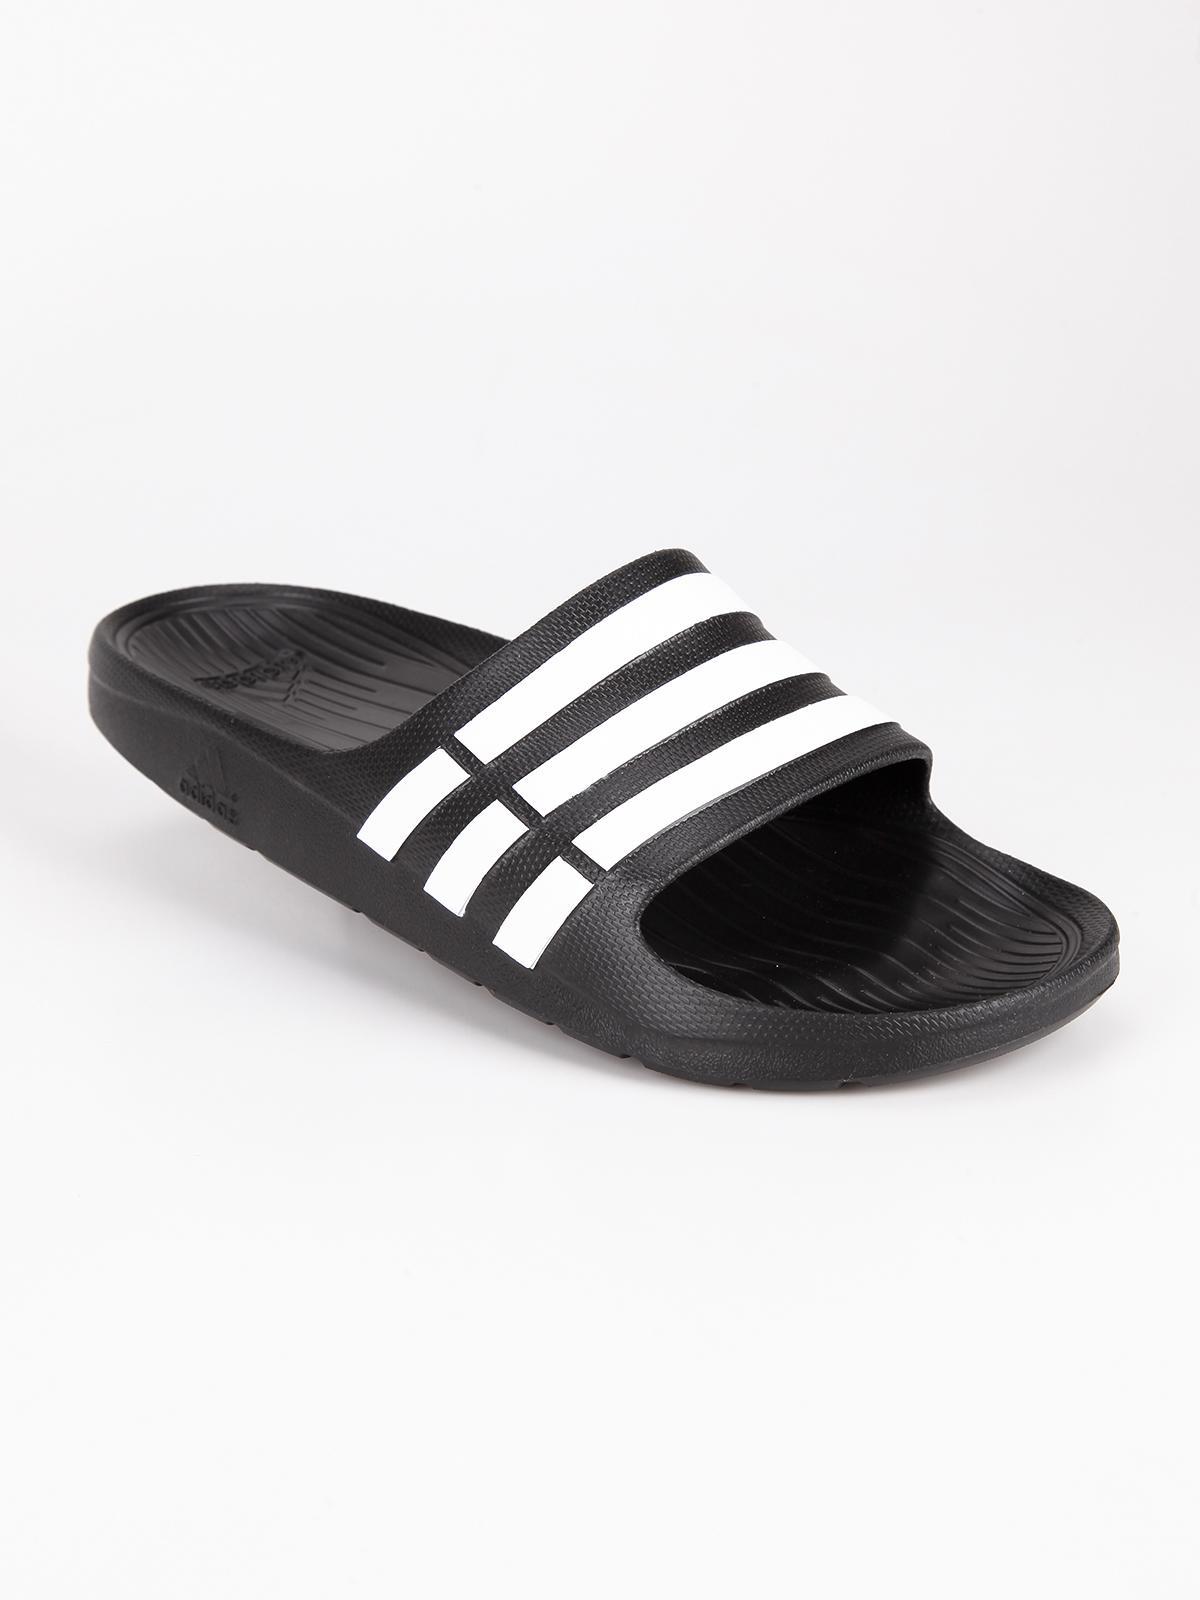 Ciabatte da piscina sportive bicolore Adidas adidas